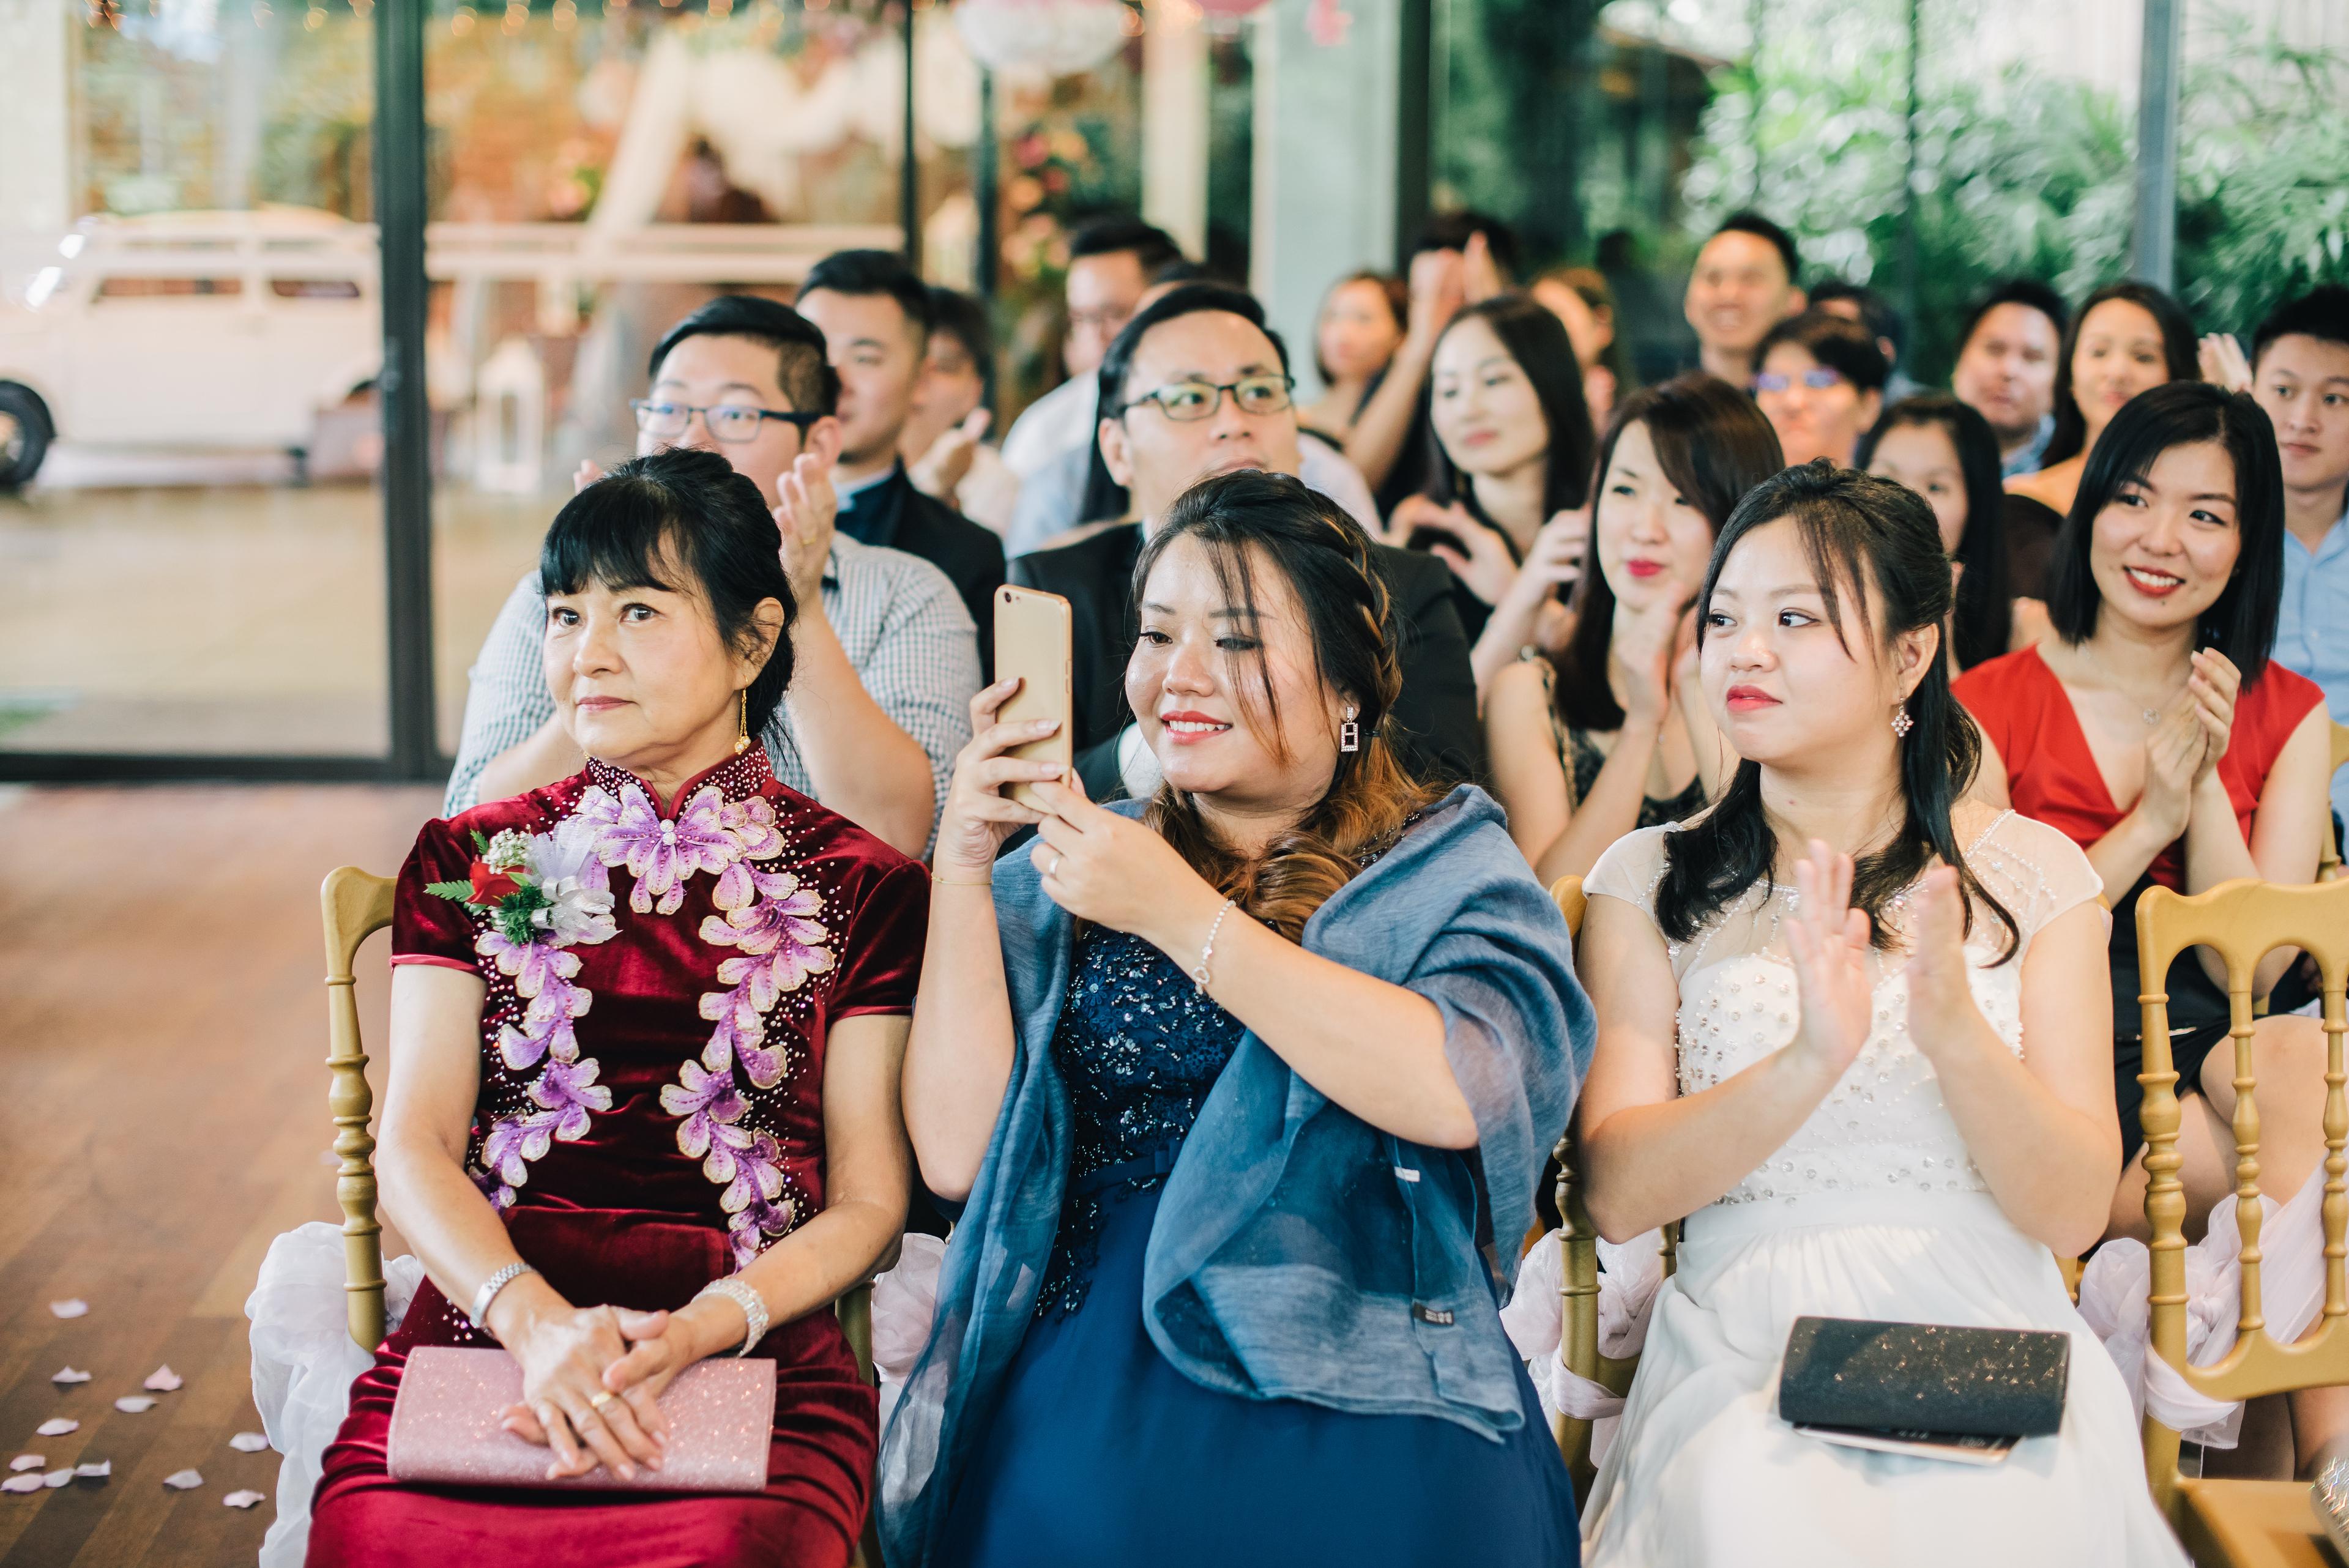 Garden Wedding ROM in Ciao Ristorante, Kuala Lumpur